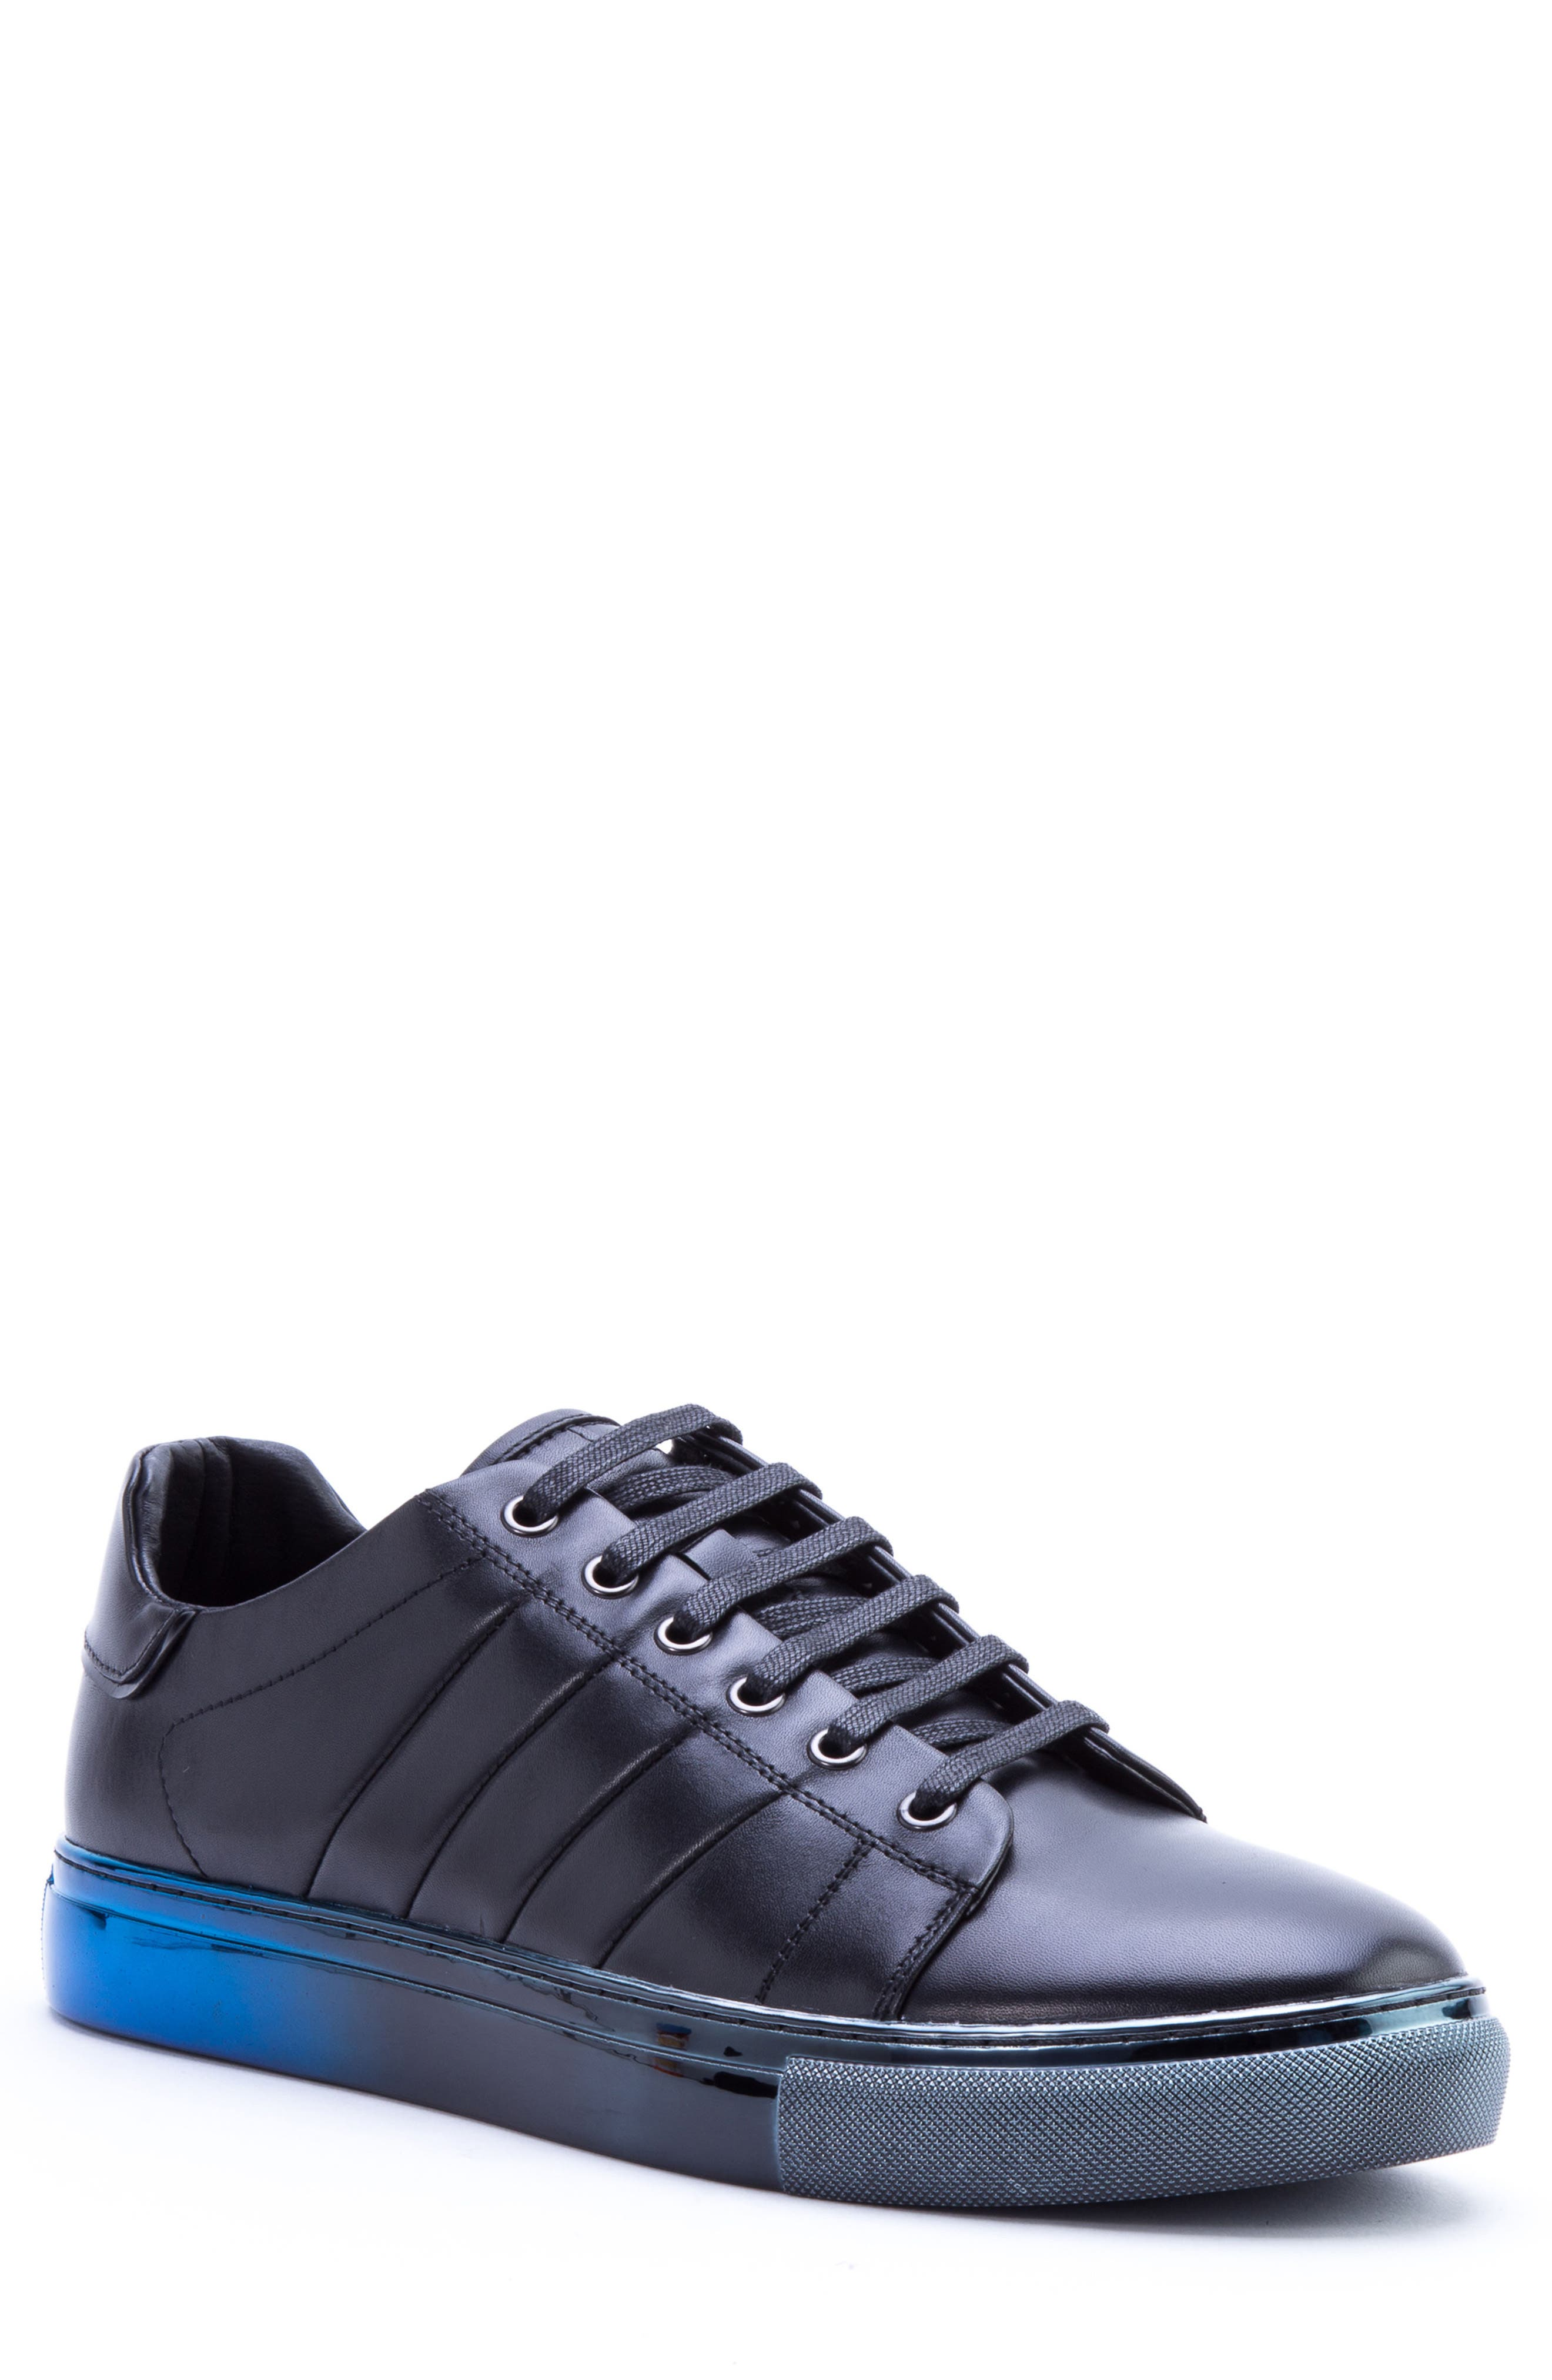 Badgley Mischka Brando Sneaker, Main, color, BLACK LEATHER